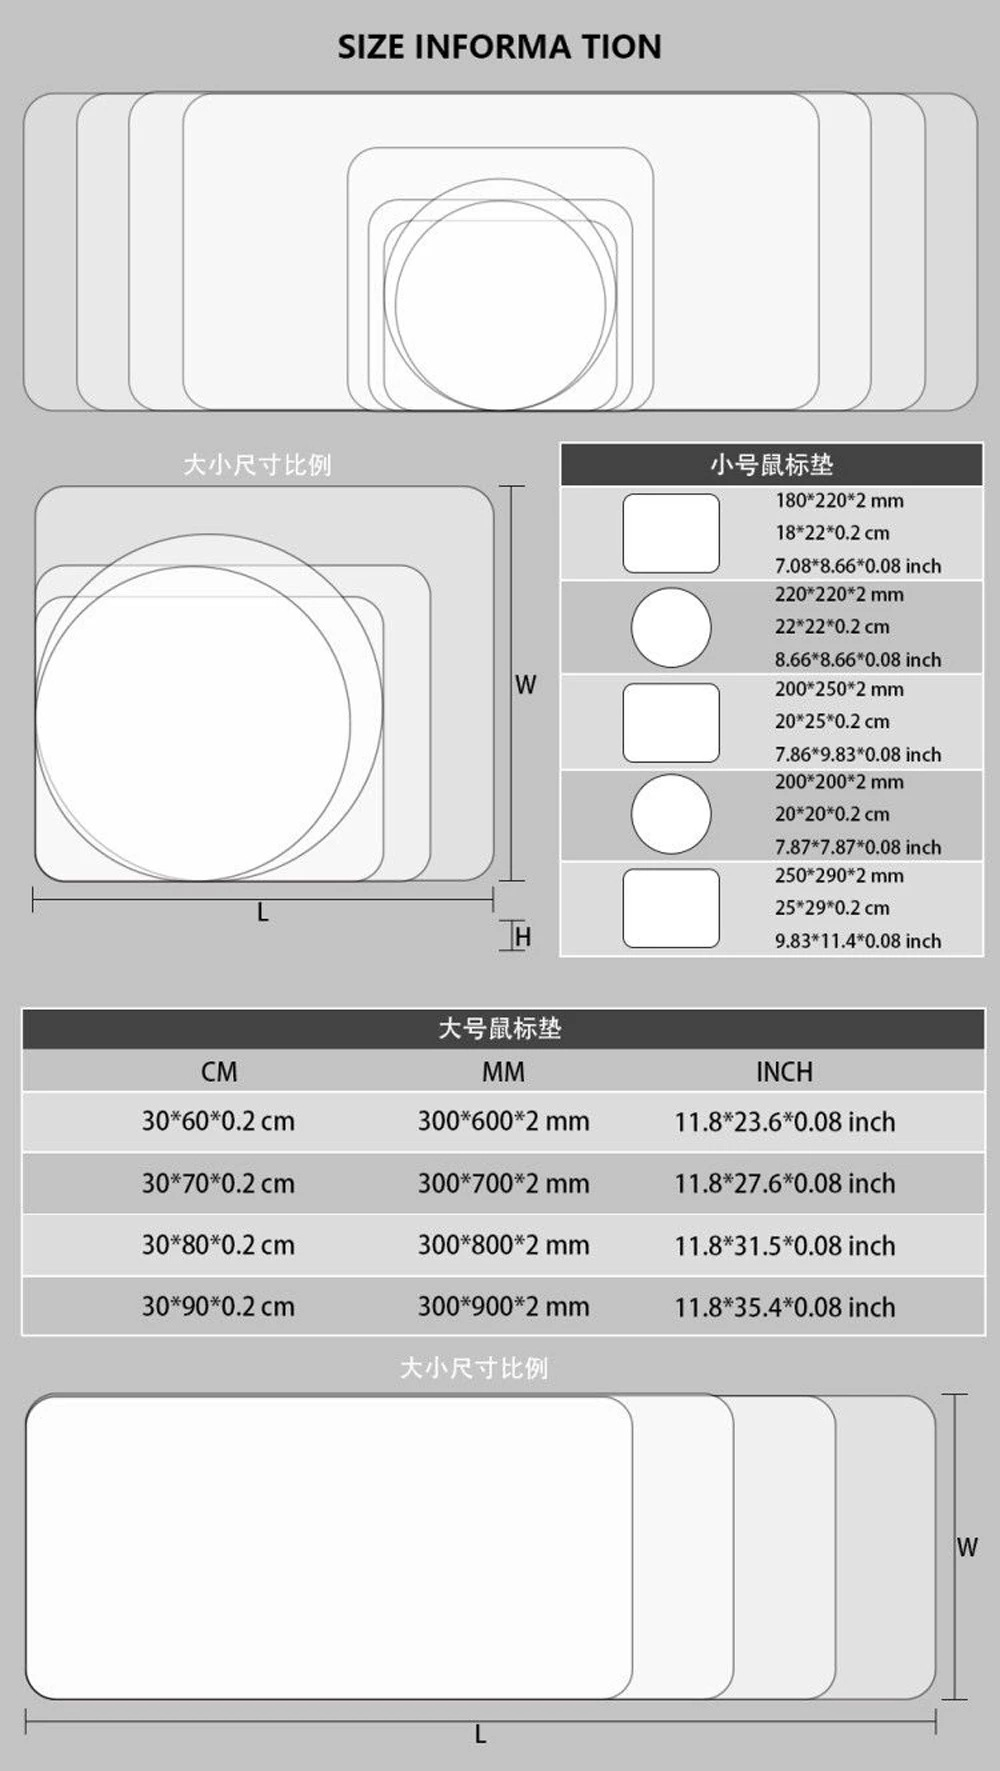 H1a5203ed675c419abef9ec25506398c7z - Anime Mousepads